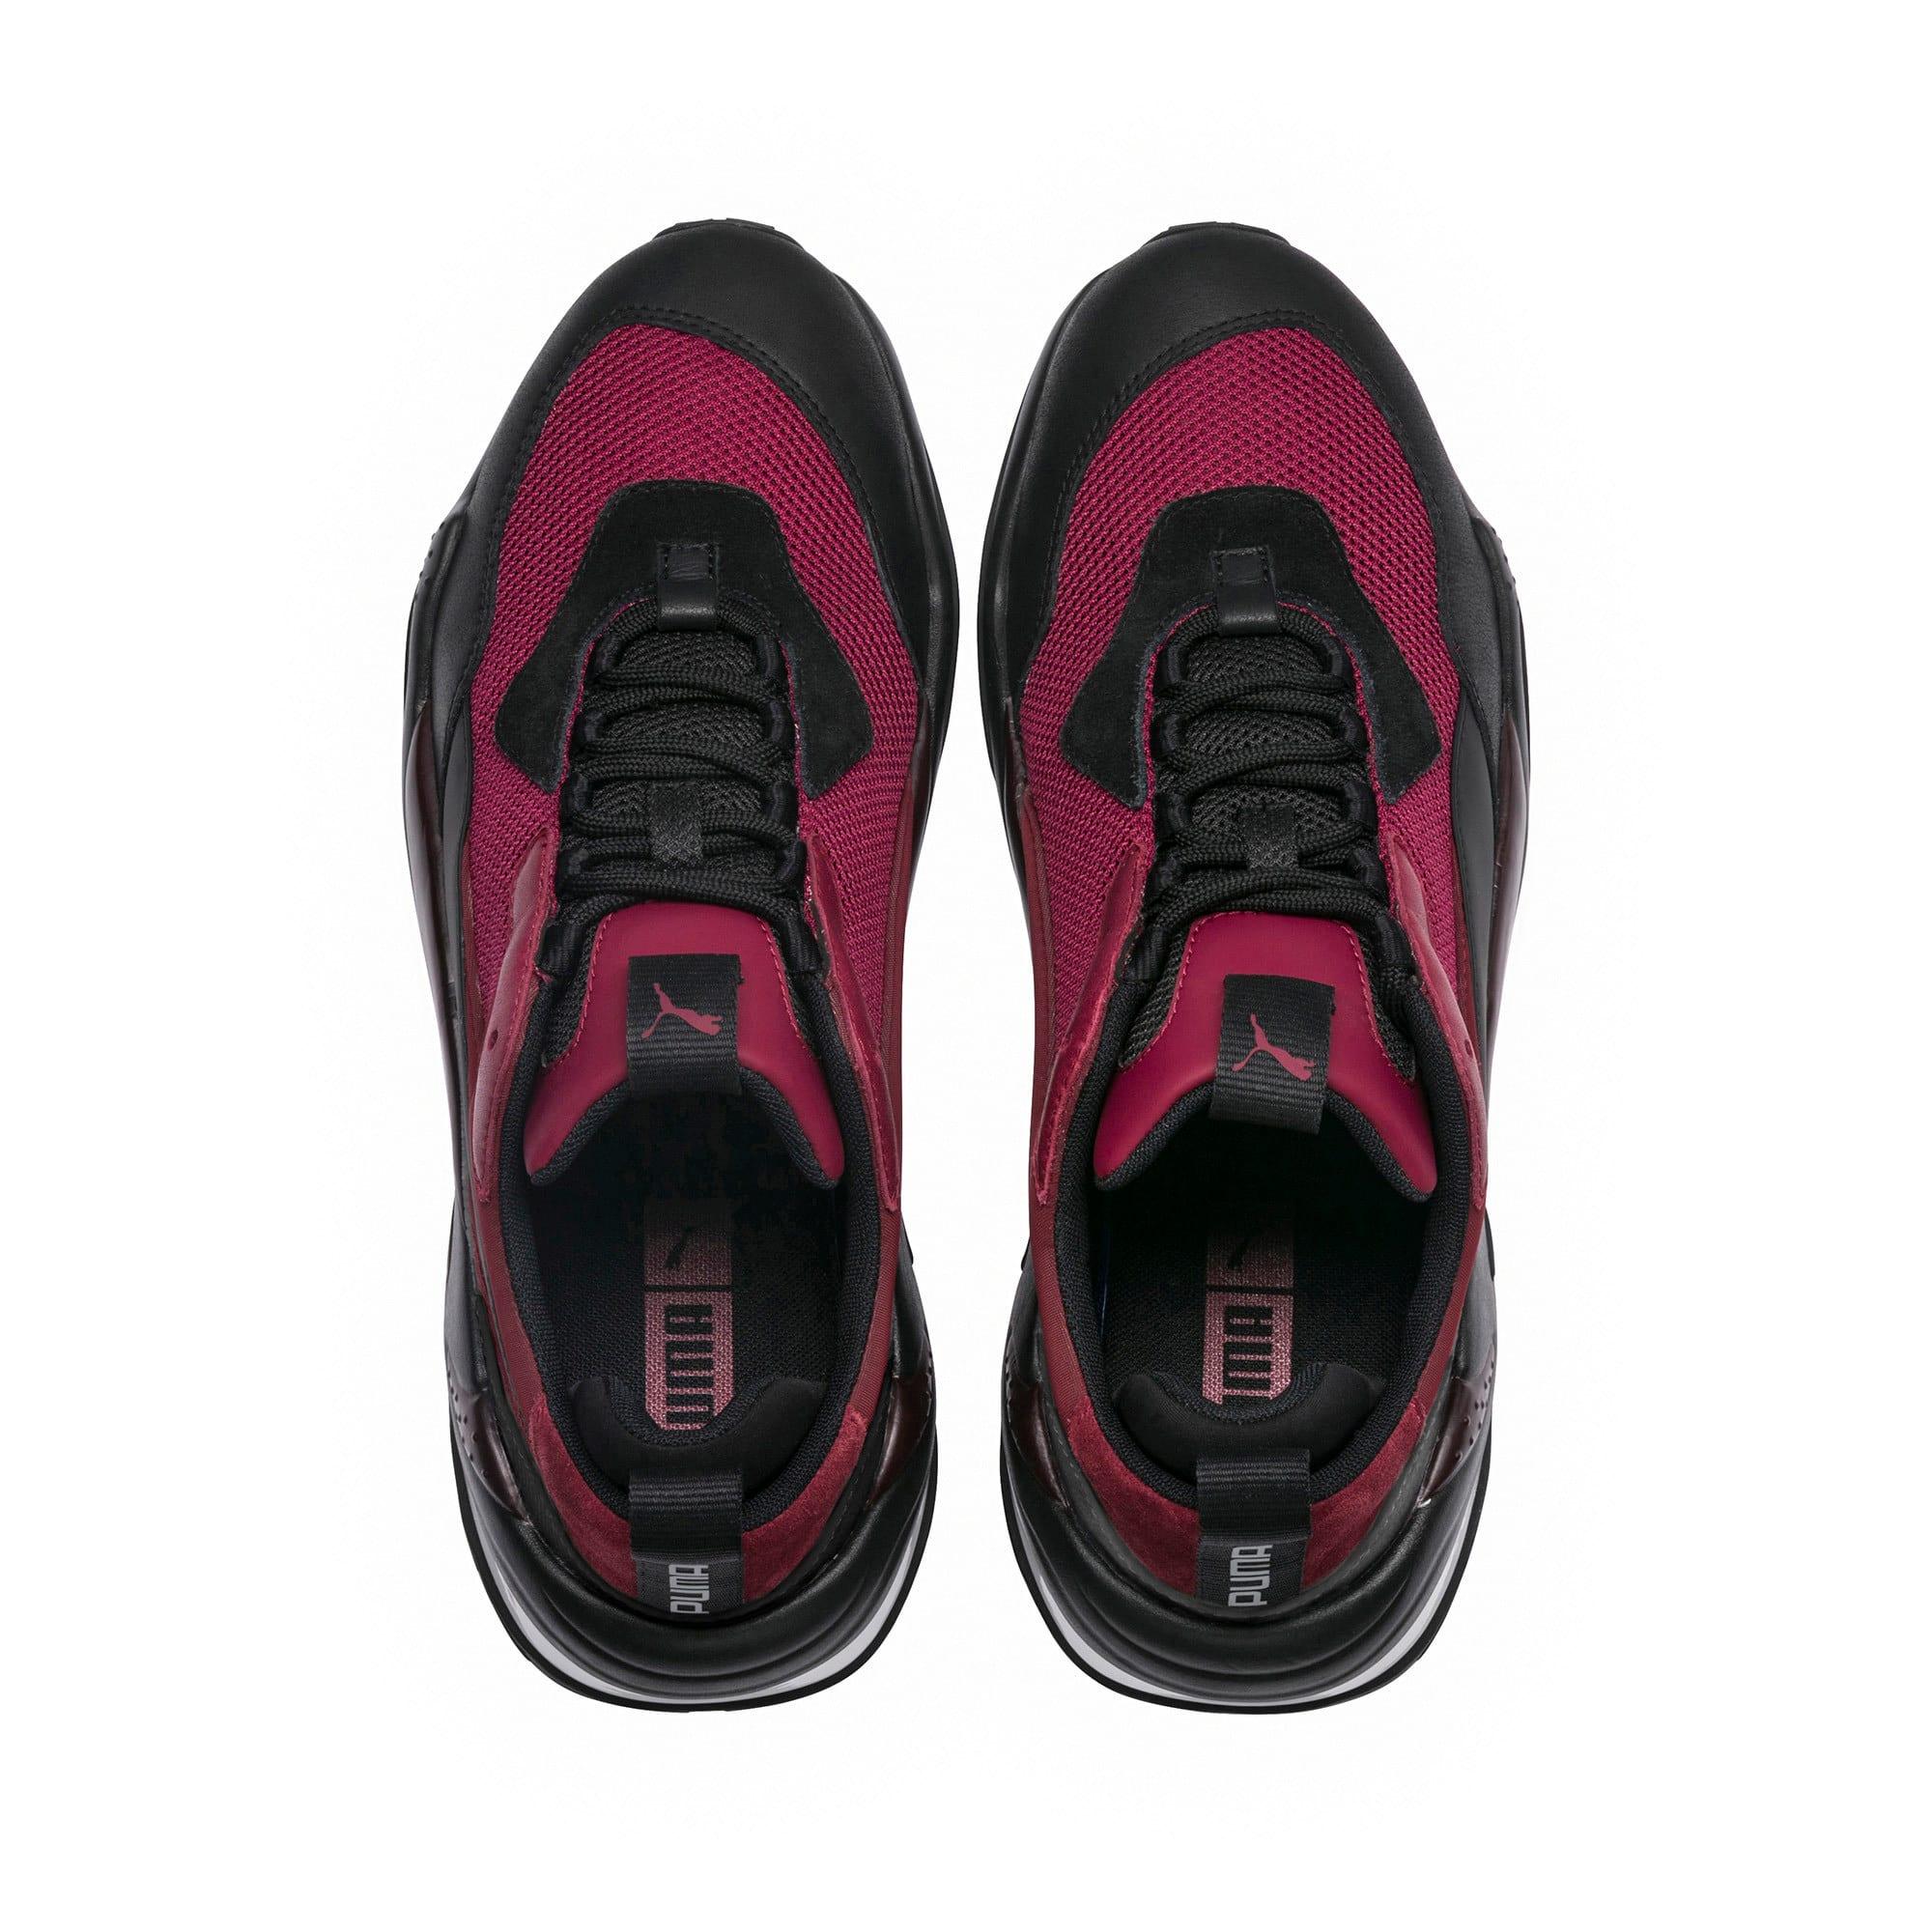 Miniatura 5 de Zapatos deportivosThunder Spectrapara hombre, Rhododendron-P Black-T Port, mediano